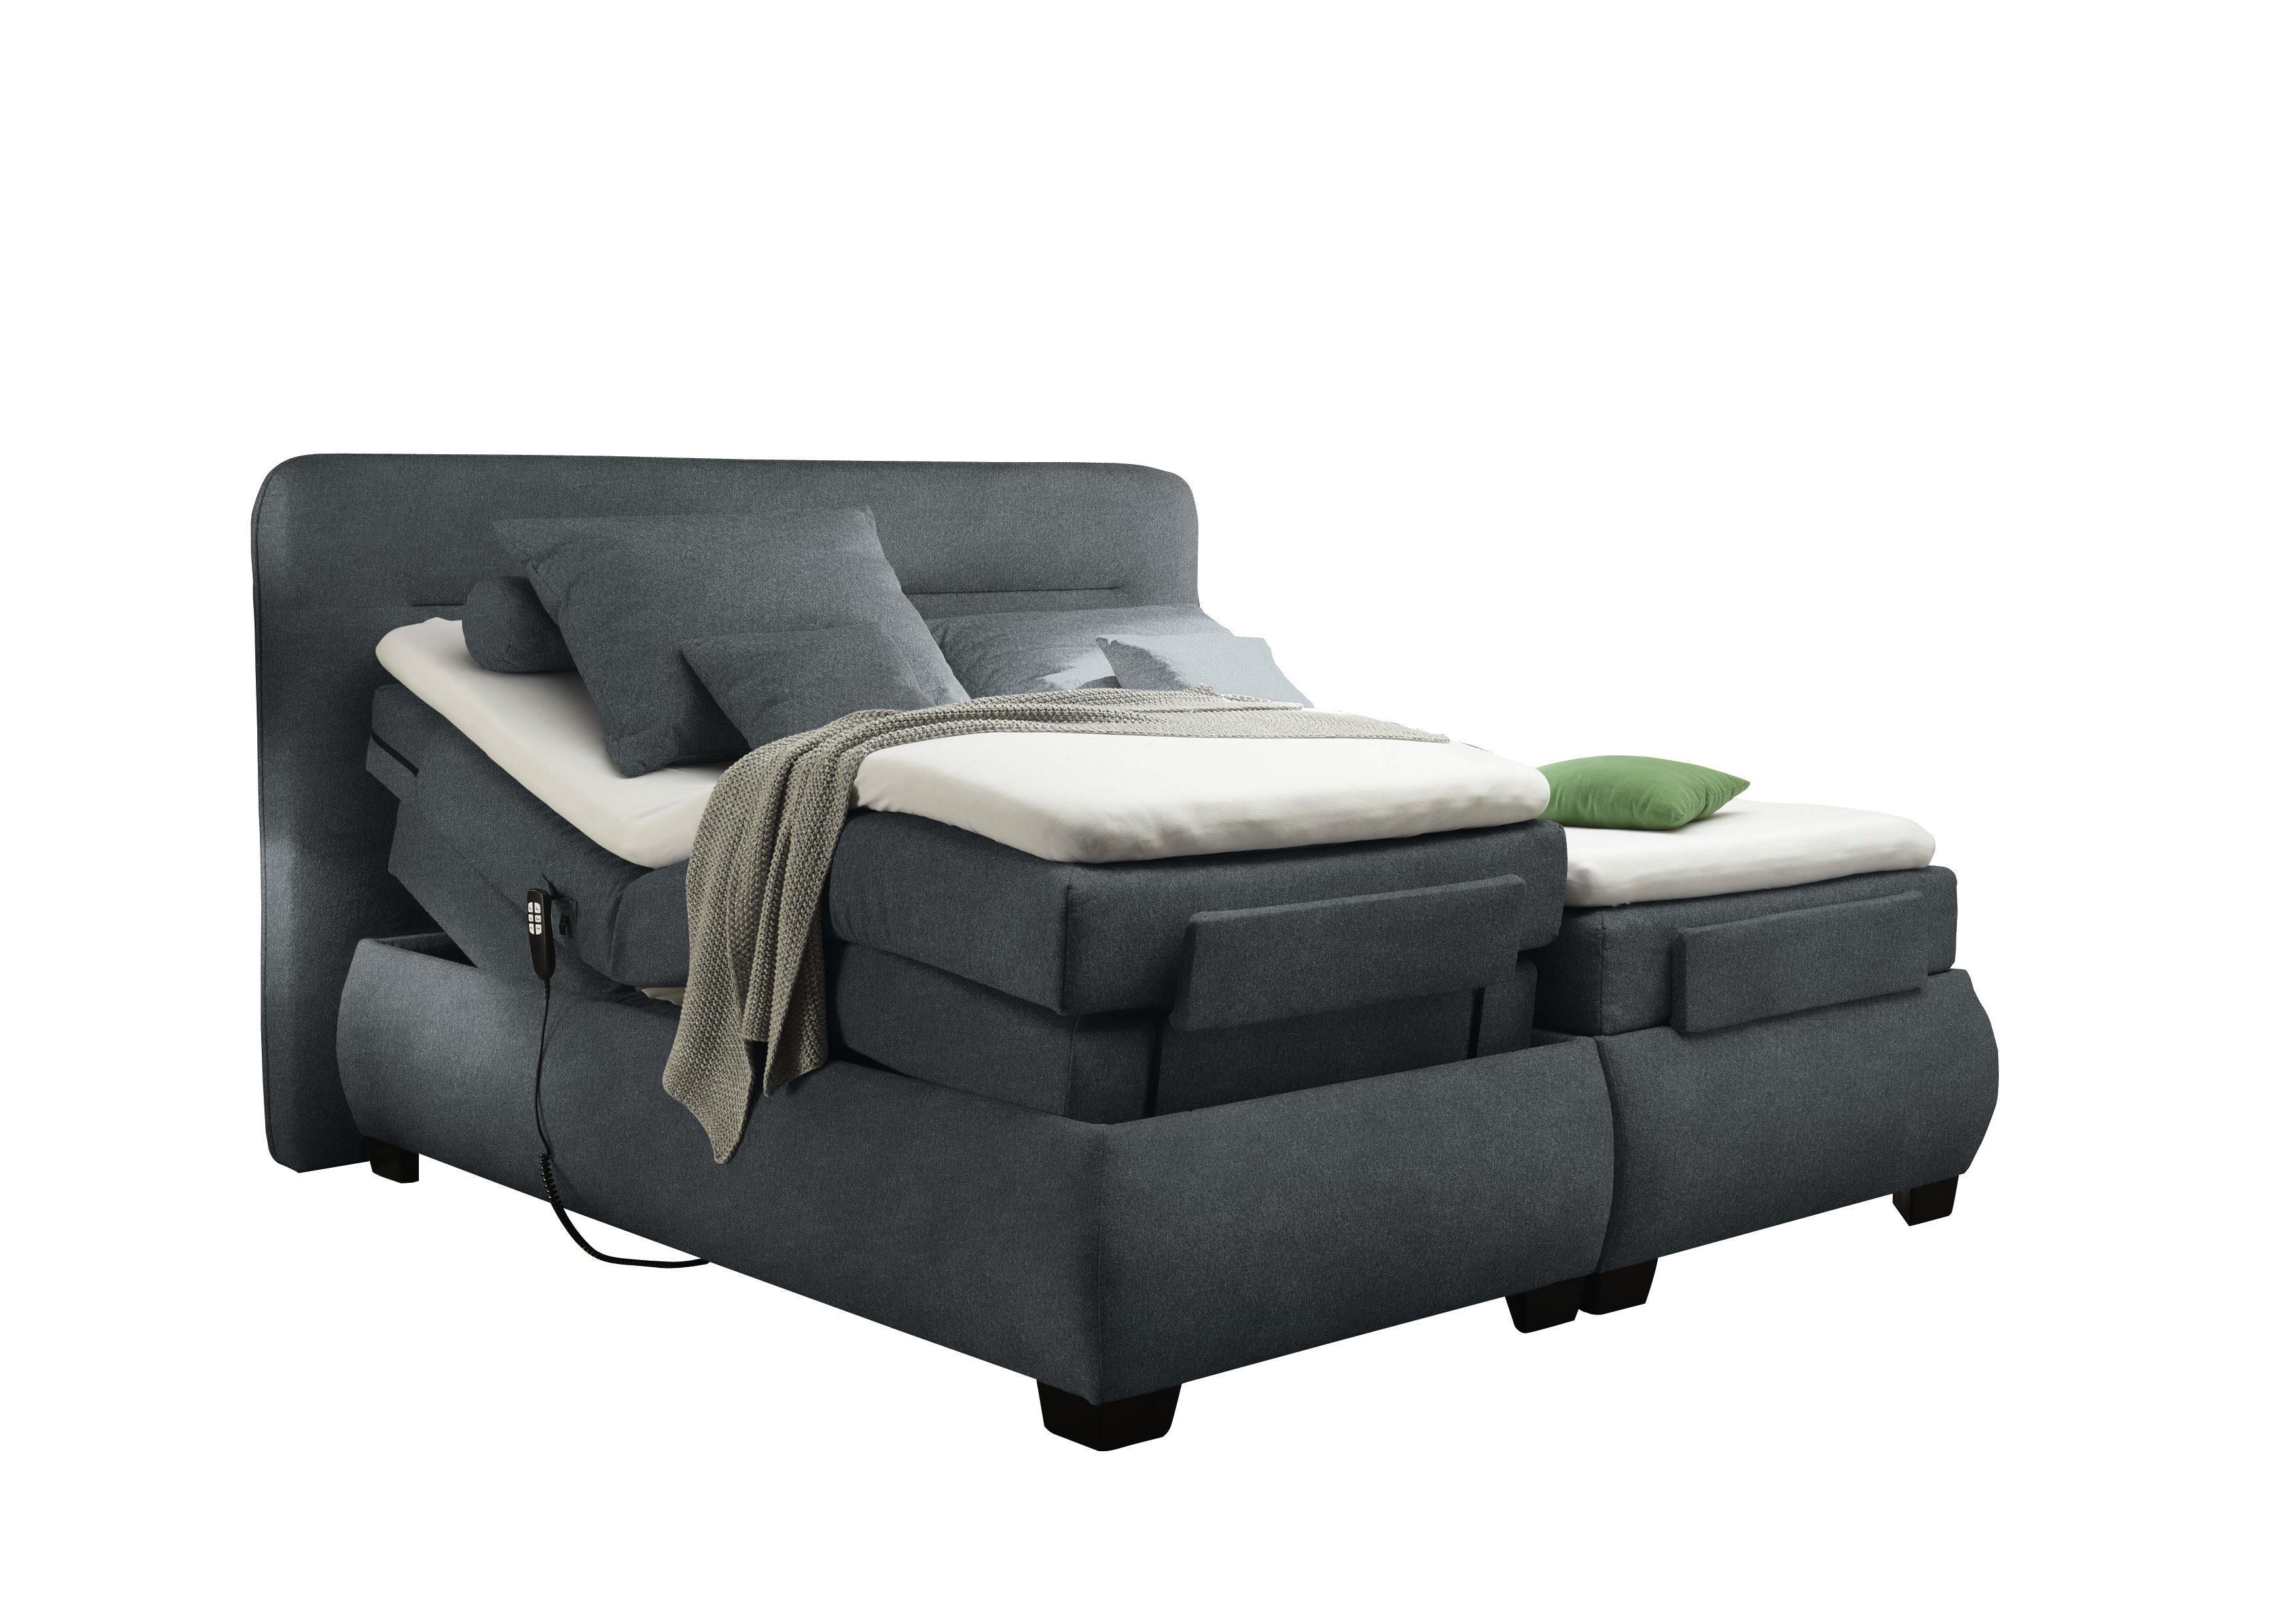 Komfortables Boxspringbett mit 180 x 200 cm kaufen